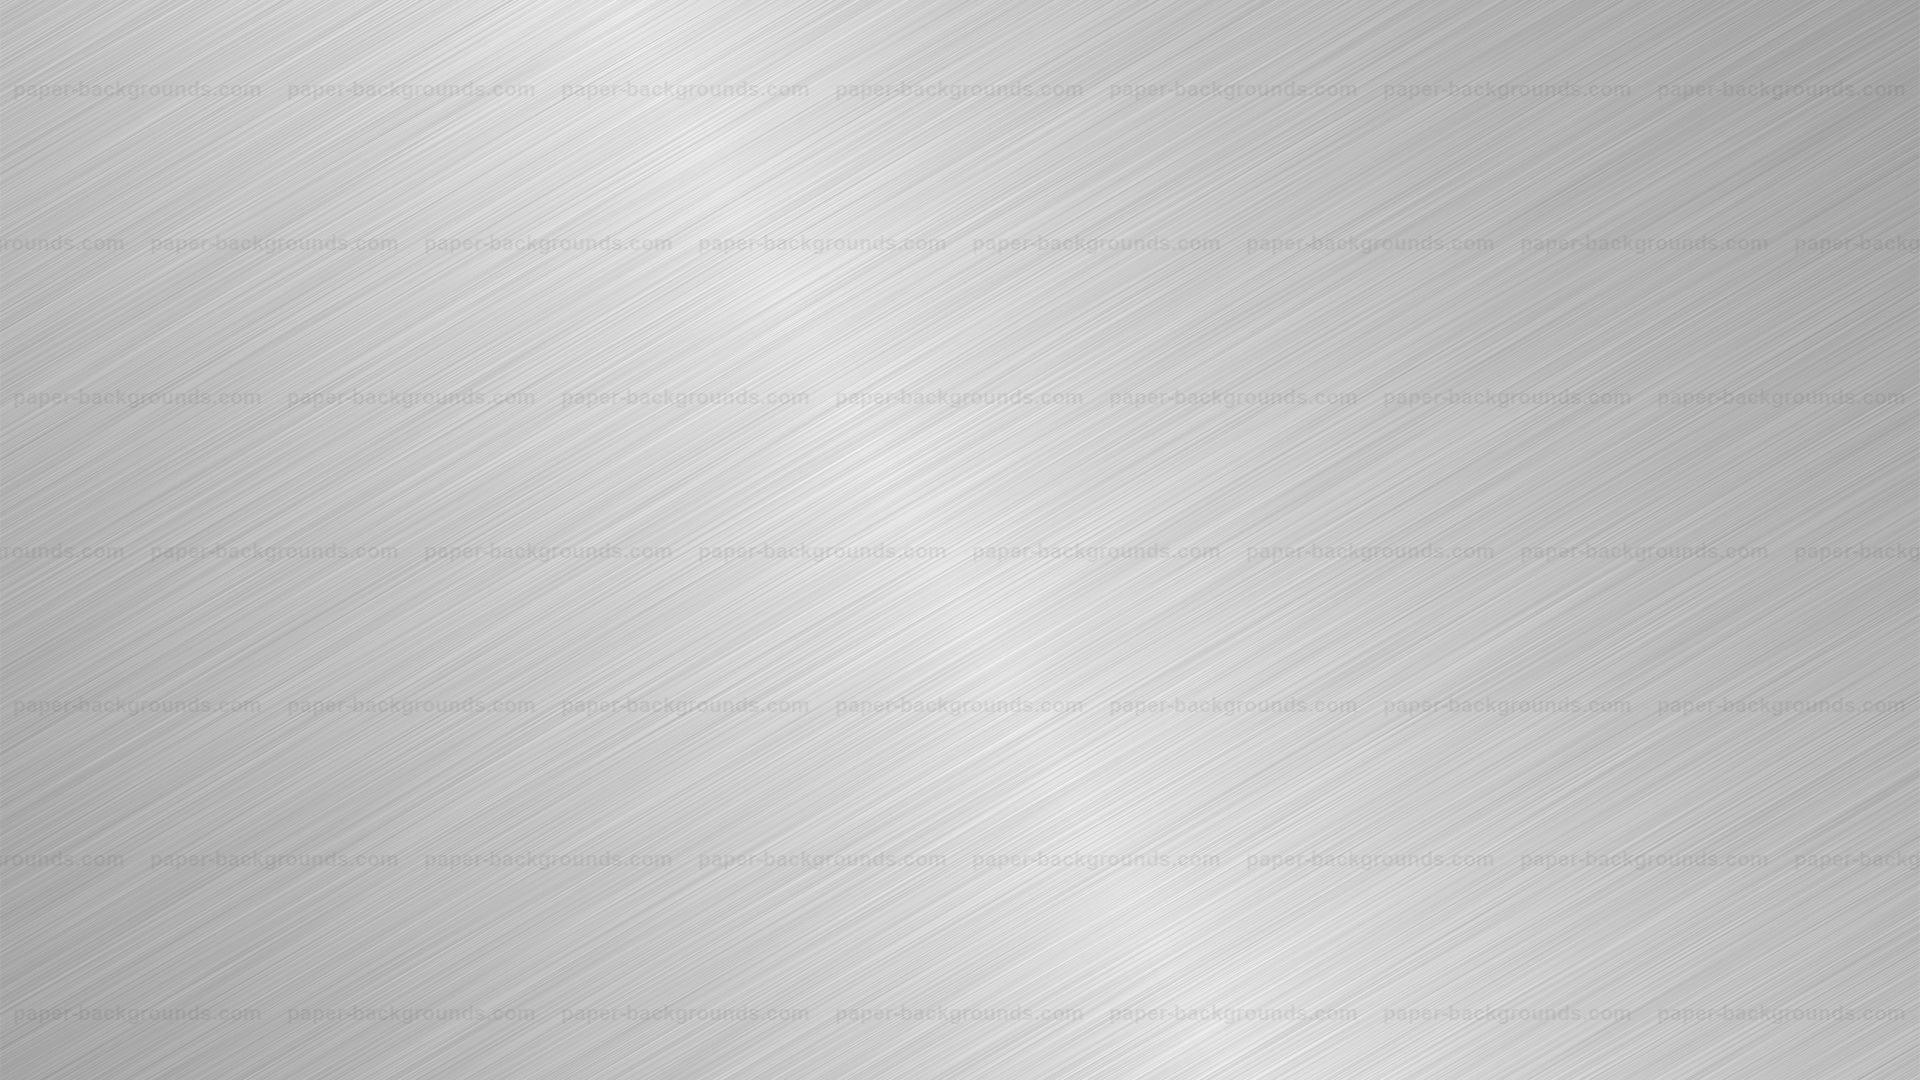 Aluminium Brushed Metal Background 1920x1080